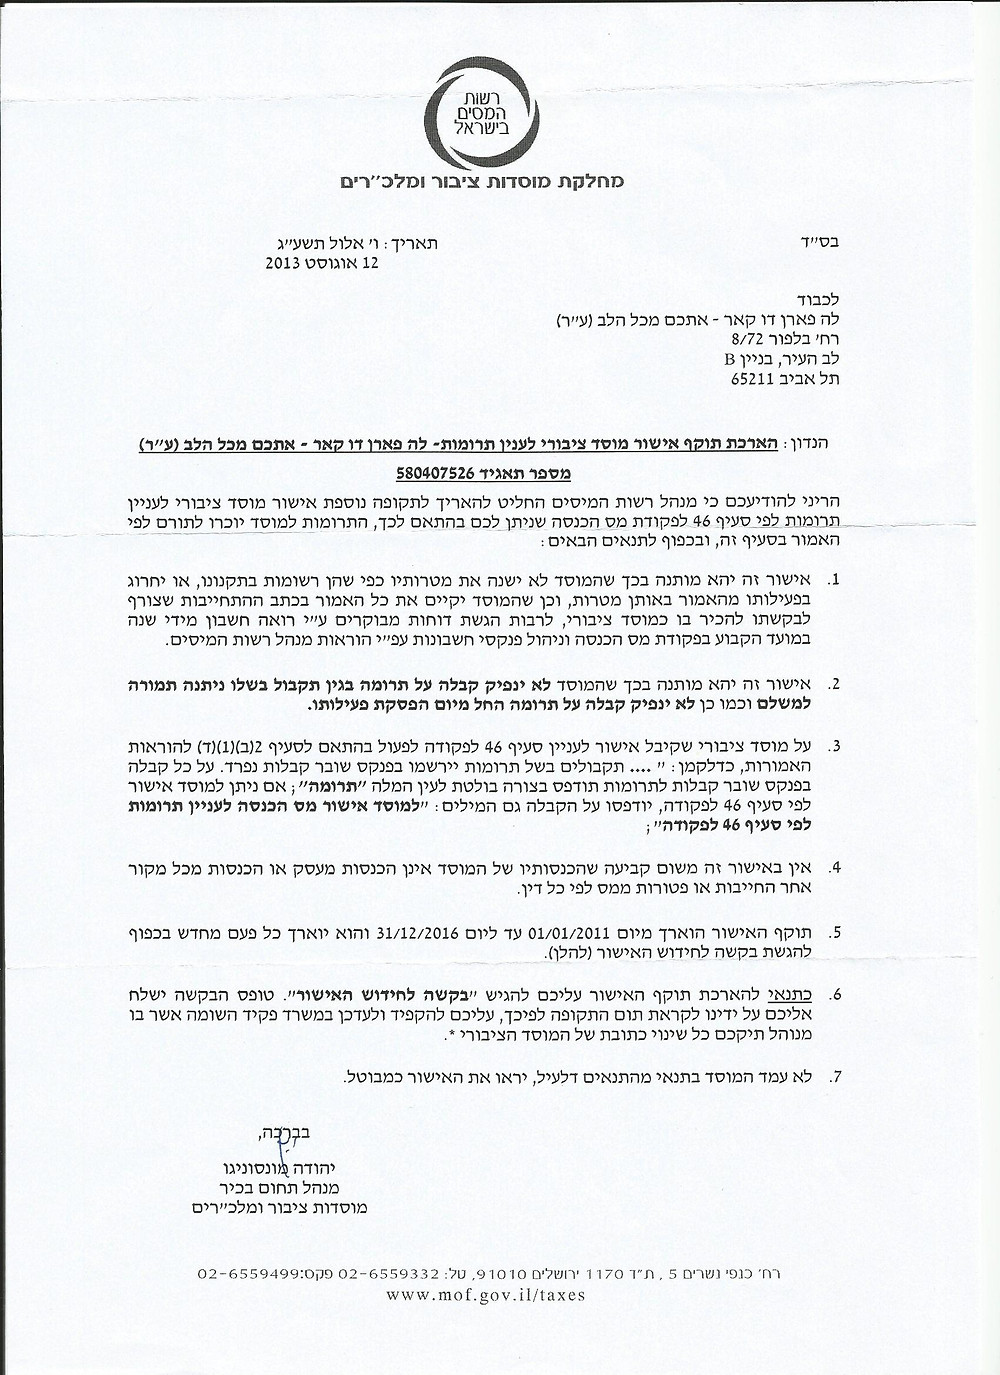 CERFA 46 israelien 2016.JPG